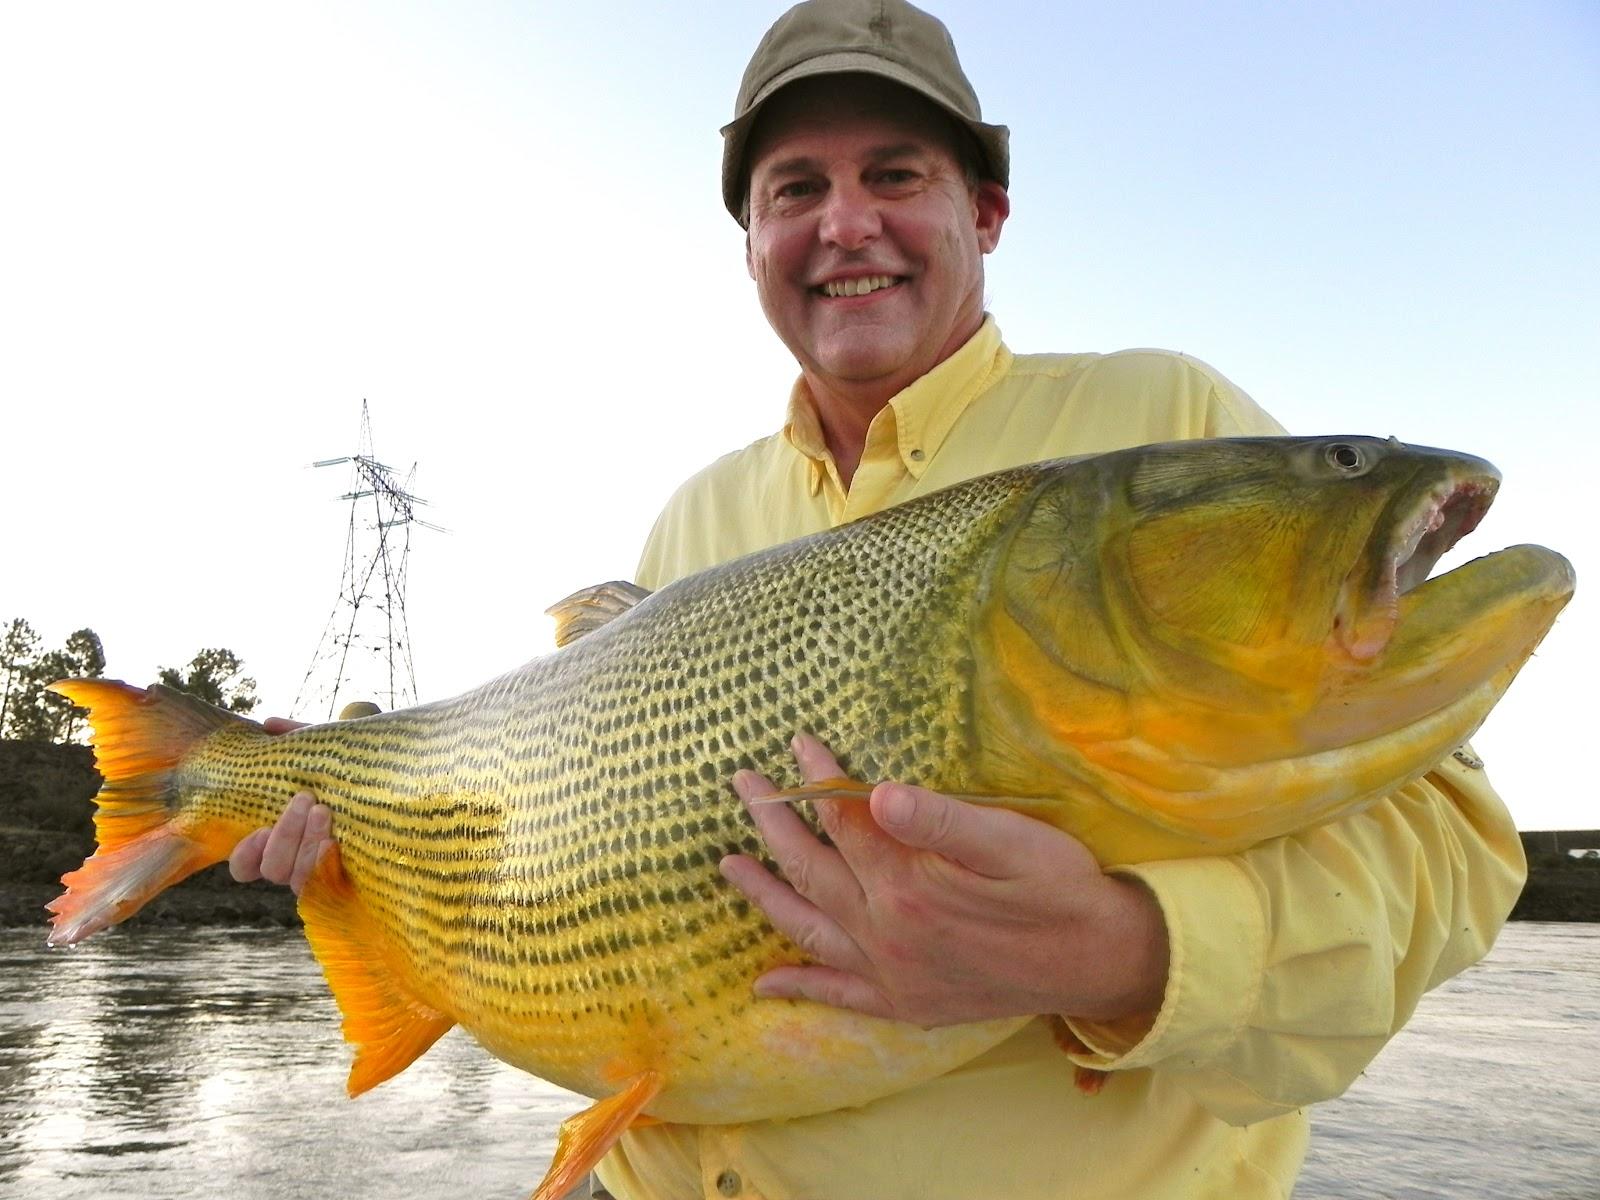 The fishing news la zona for monster golden dorado for Golden dorado fish